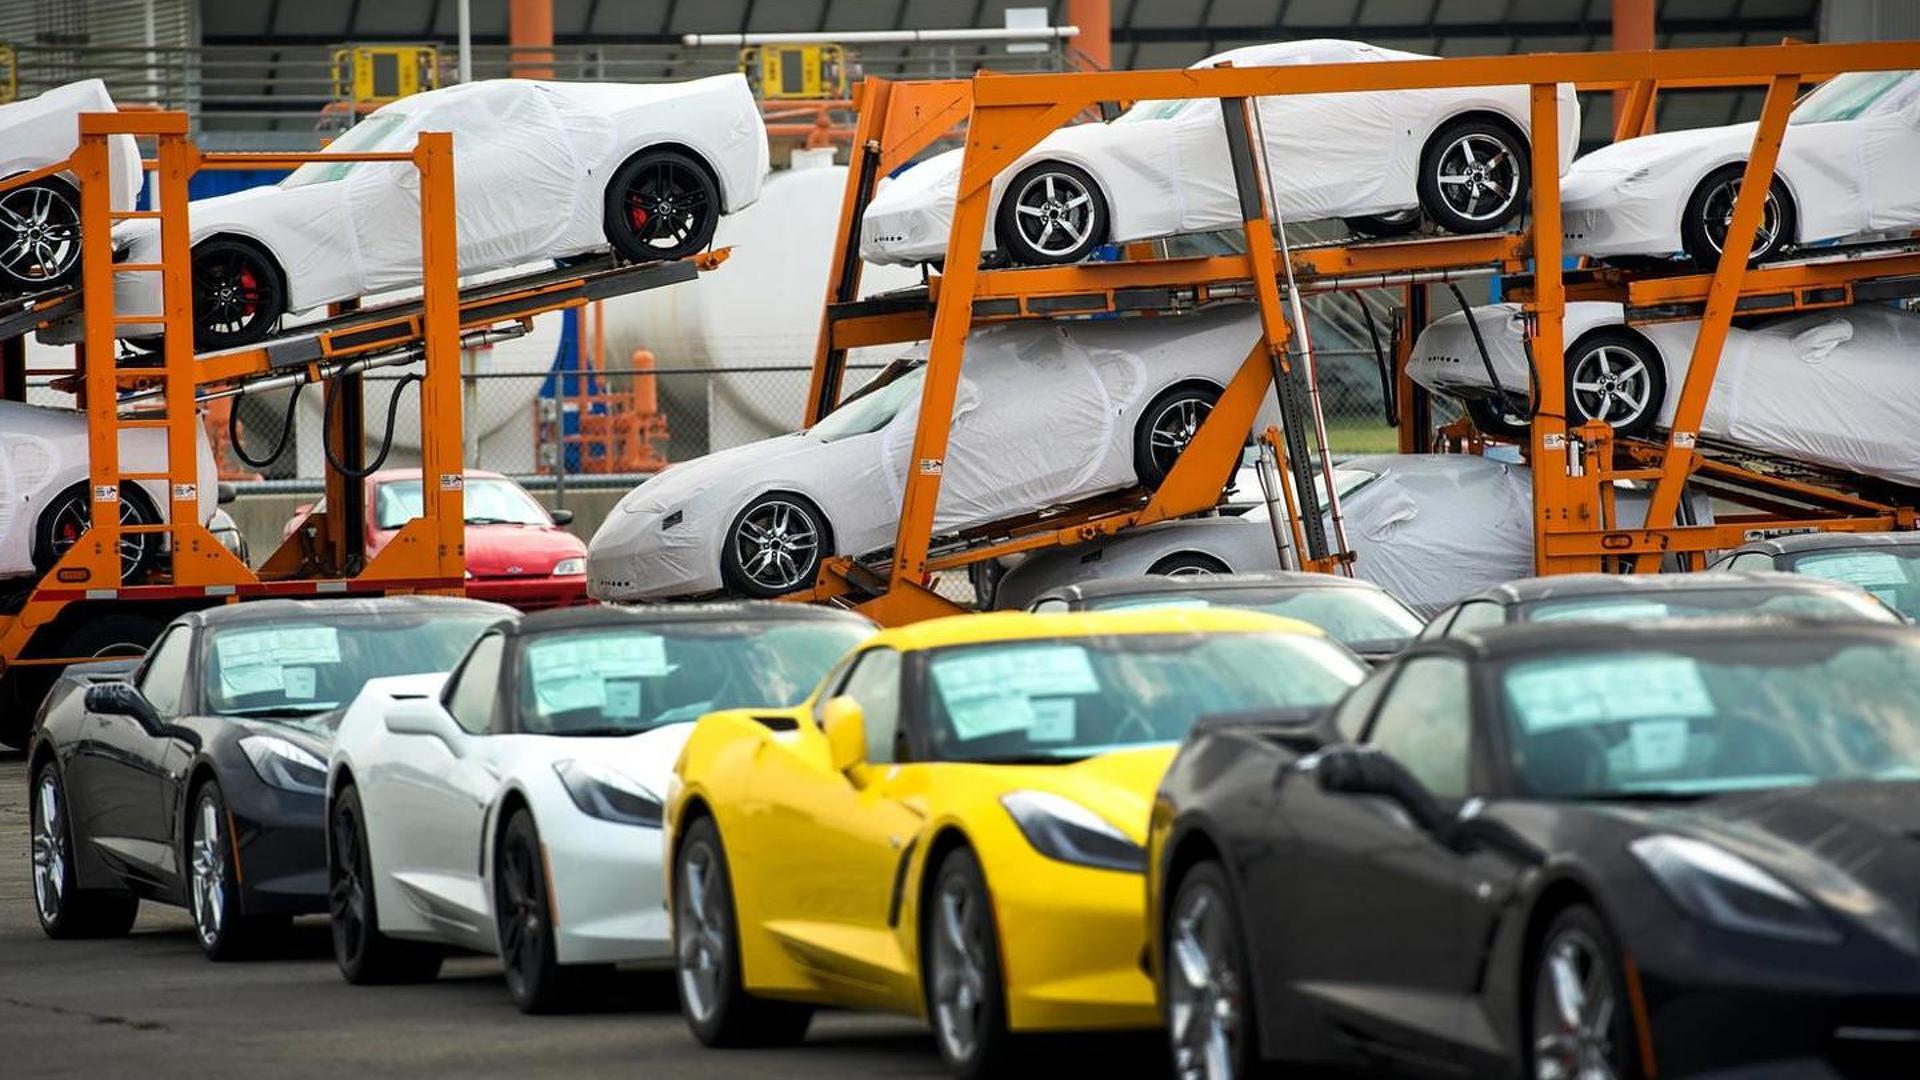 2014 Chevrolet Corvette shipping kicks off